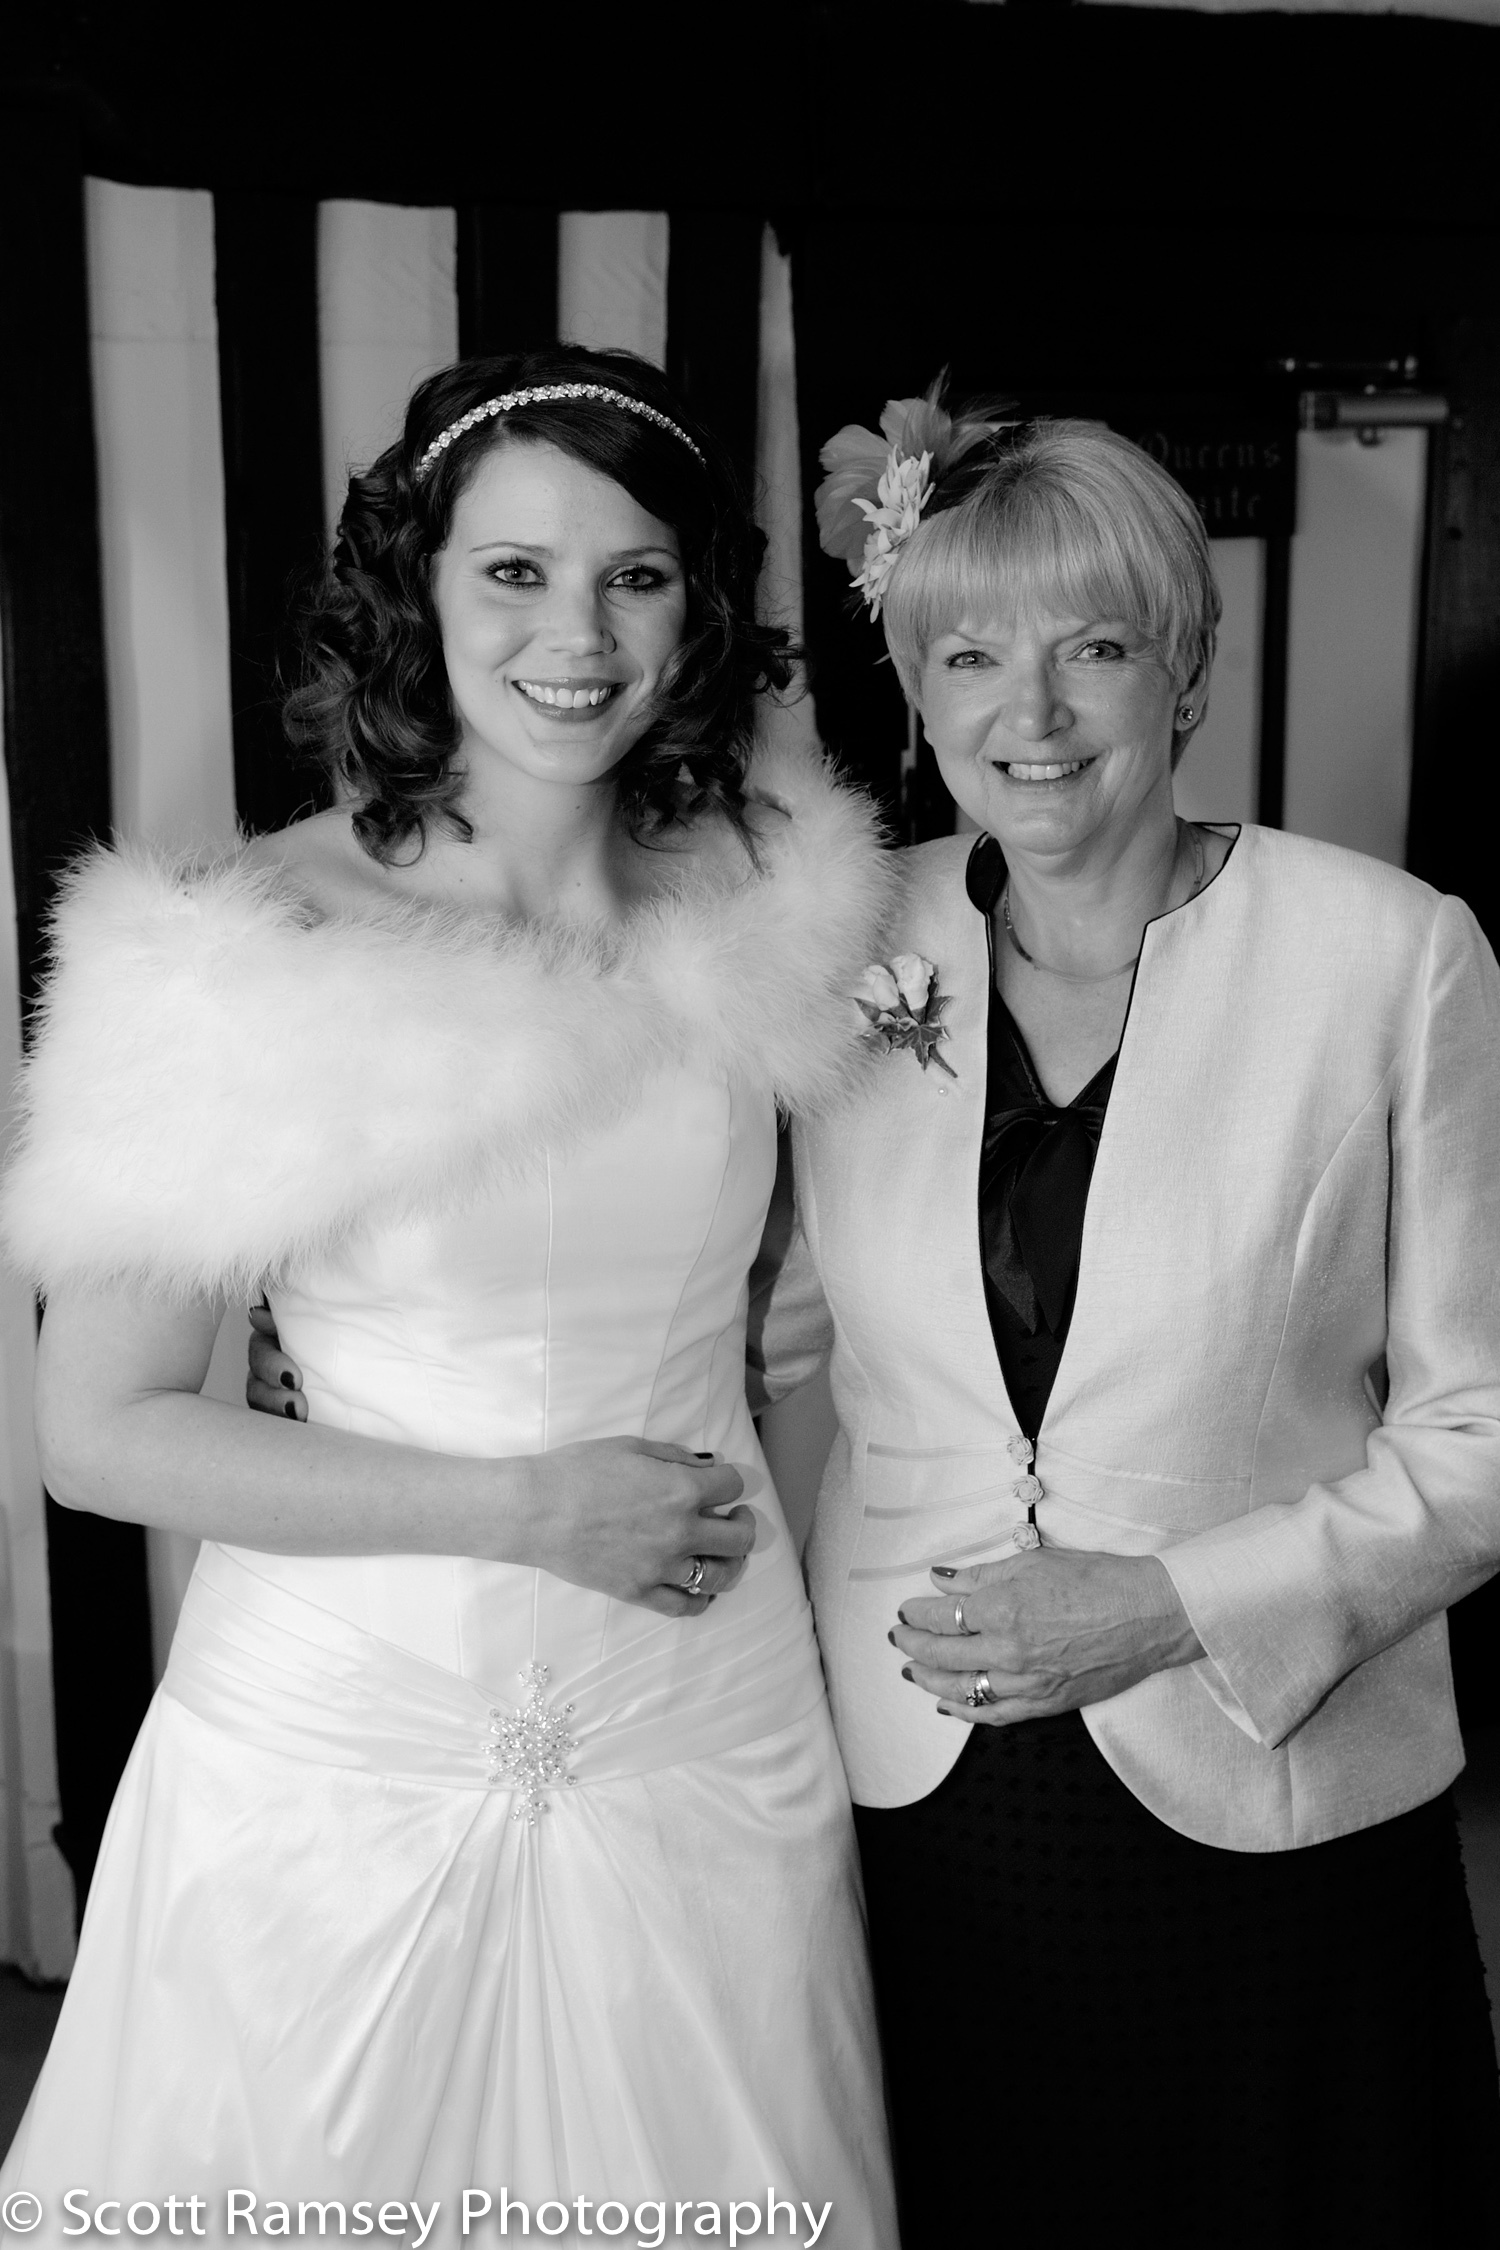 Winter-Wedding-Spread-Eagle-Hotel-Midhurst-Bride-And-Mum-031210-